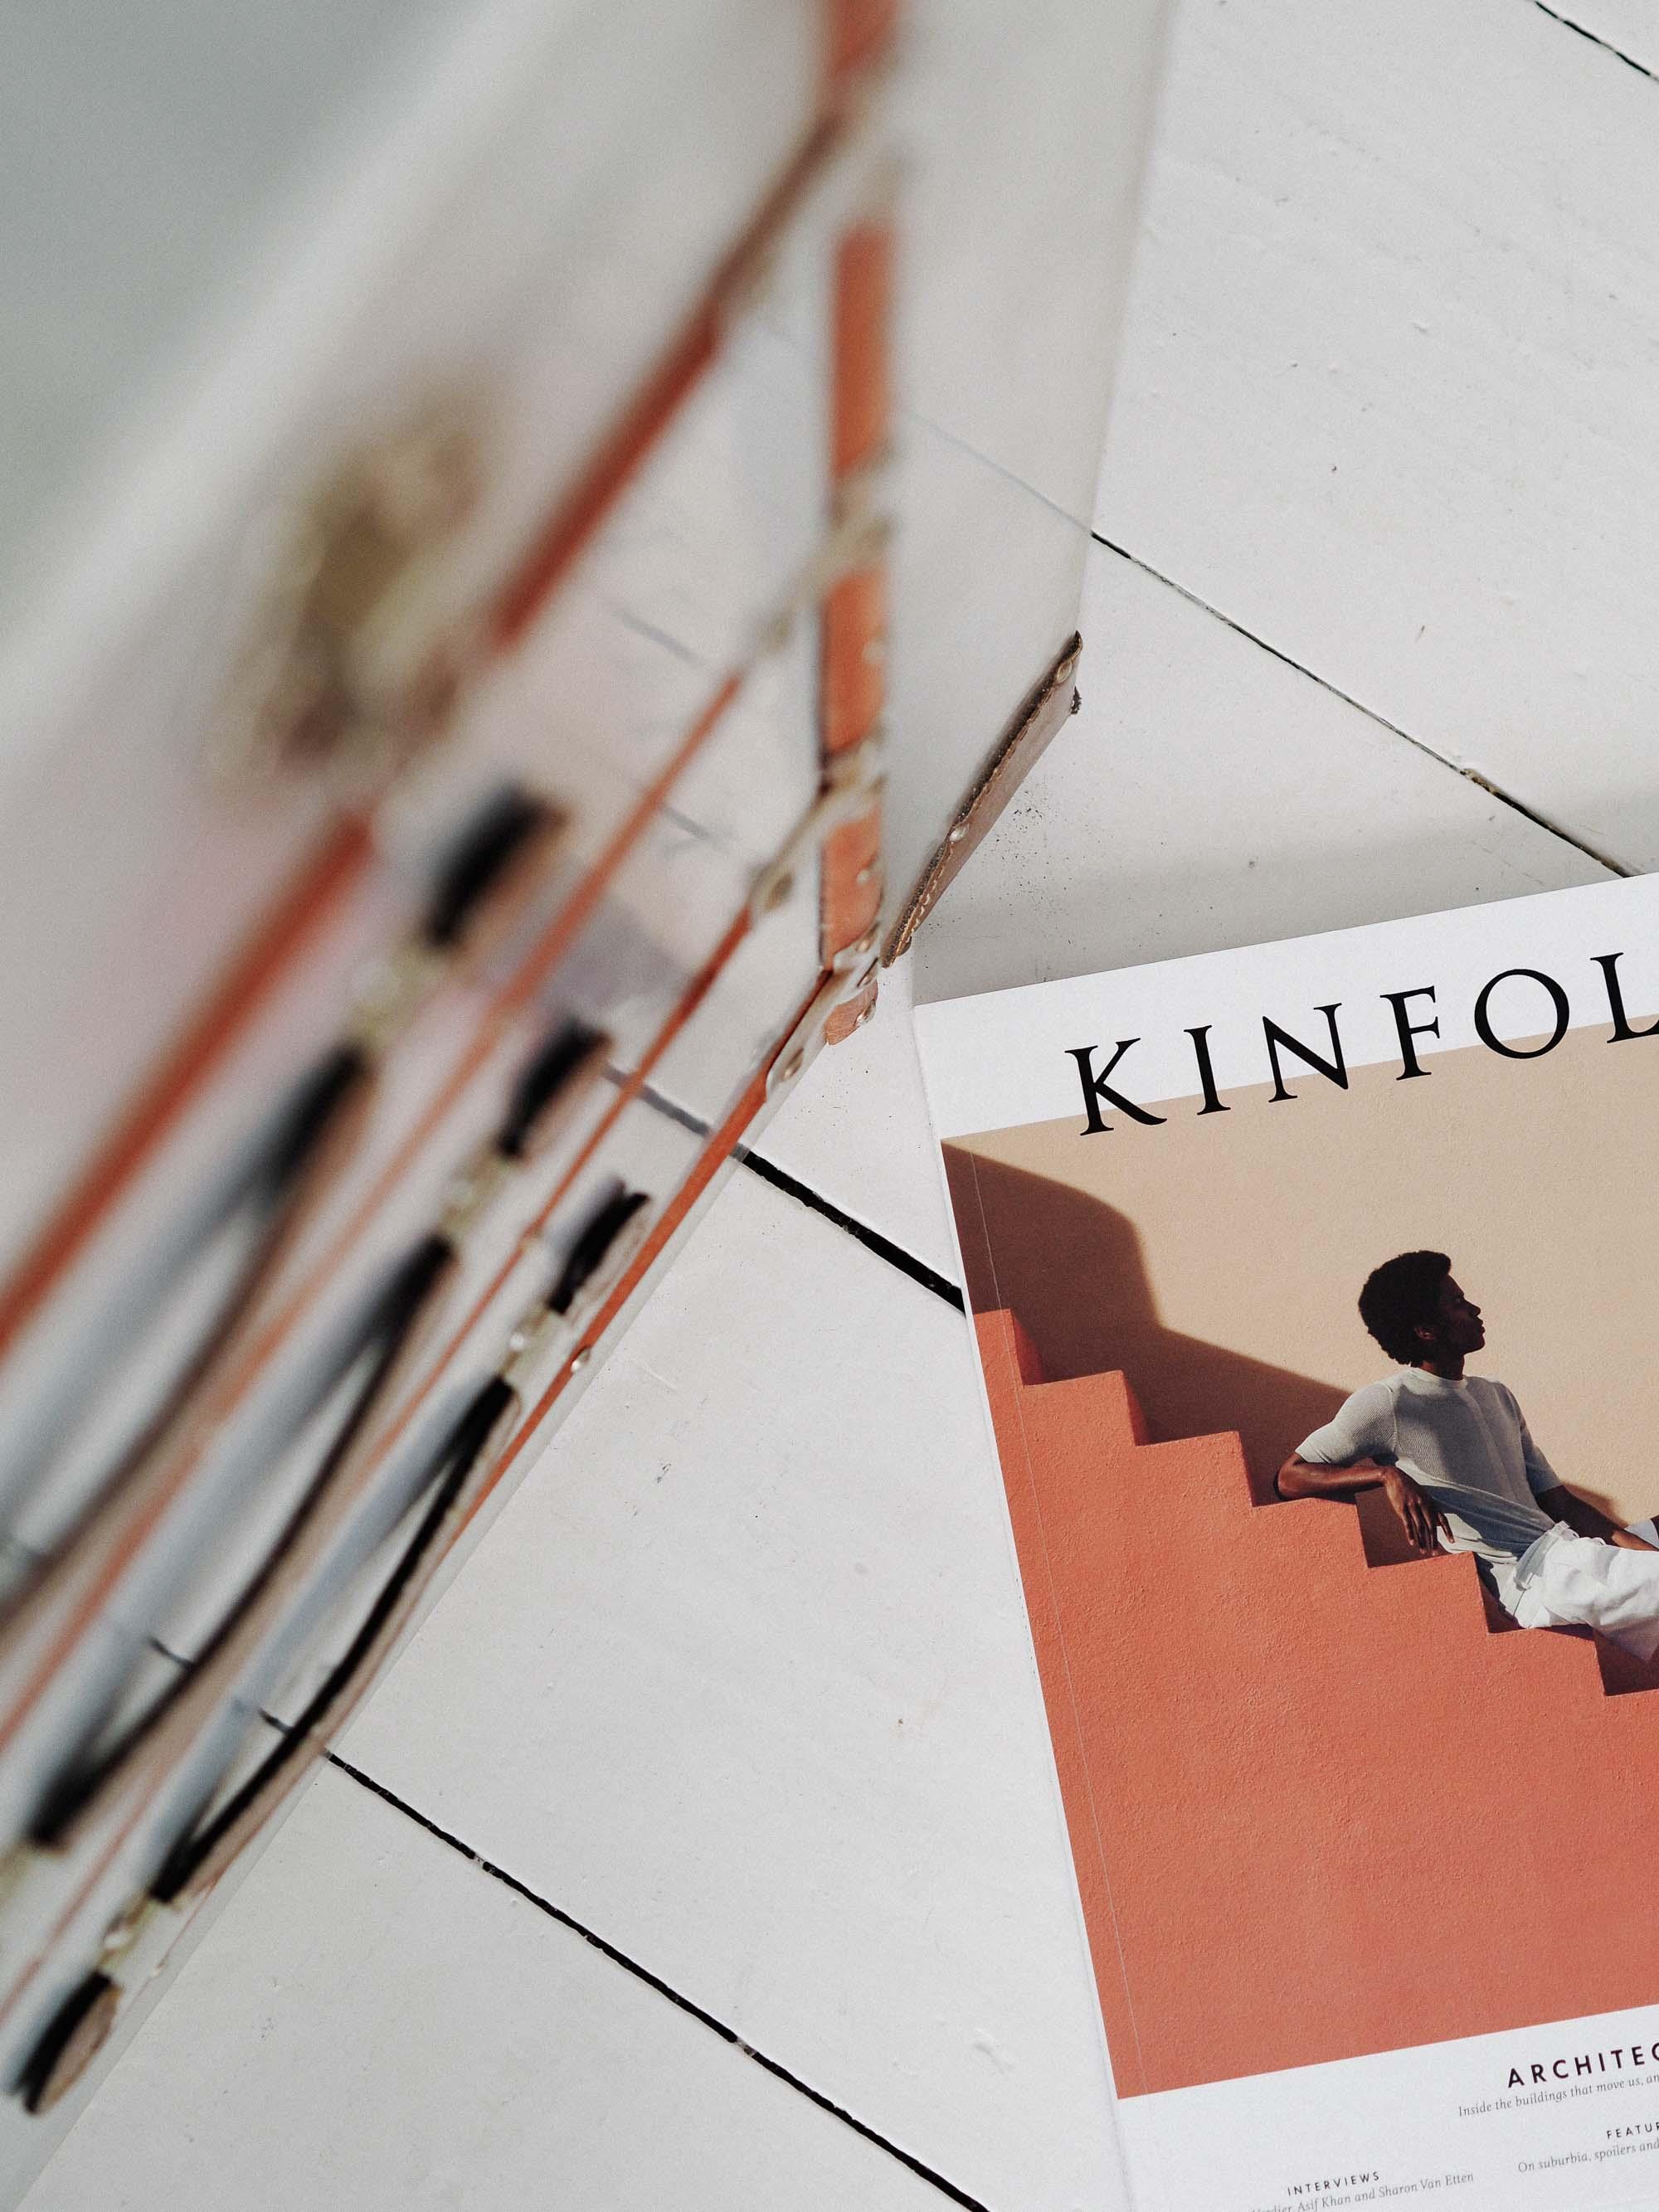 14 kinfolk magazine on wooden floor SBS.jpg